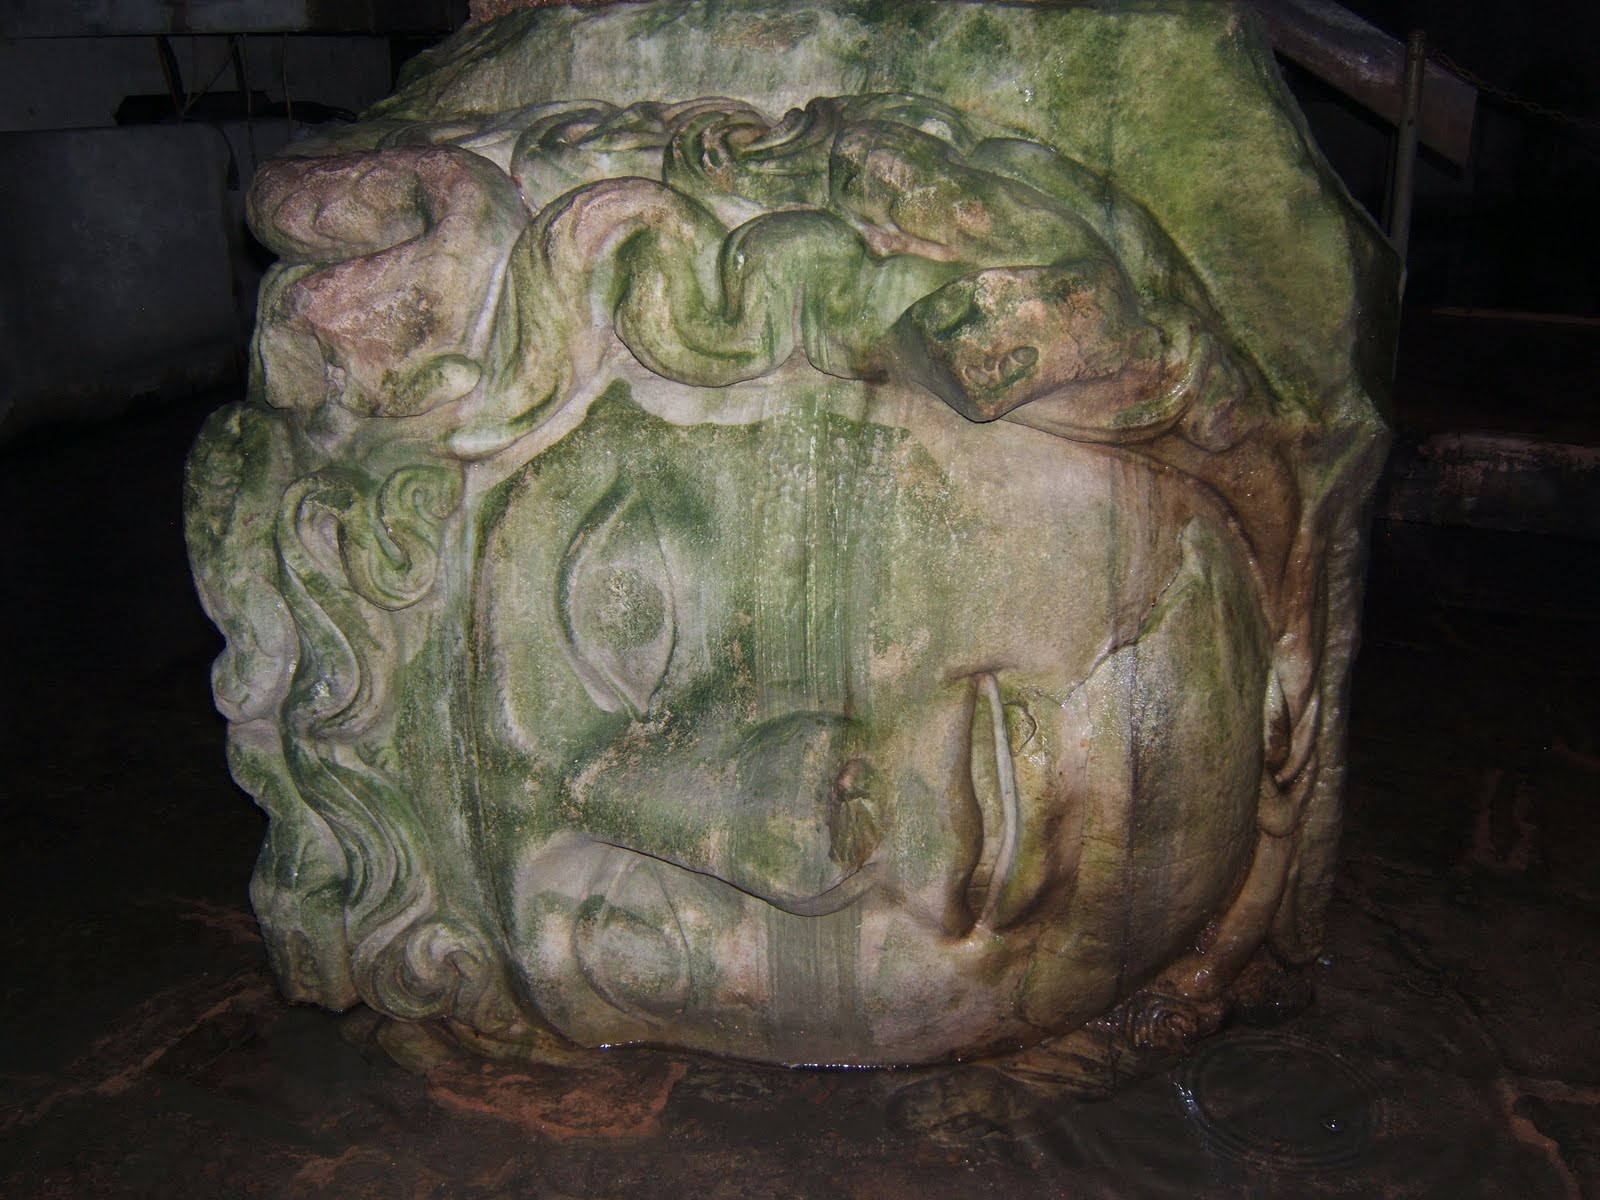 Medusa Head.  Roman cistern underground. Istanbul, Turkey